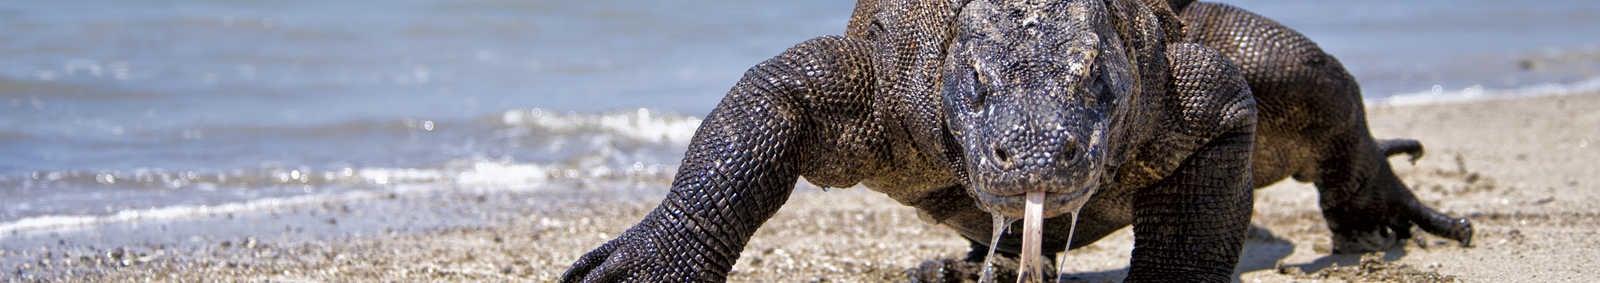 Komodo Dragon in Komodo Island National Park, Indonesia